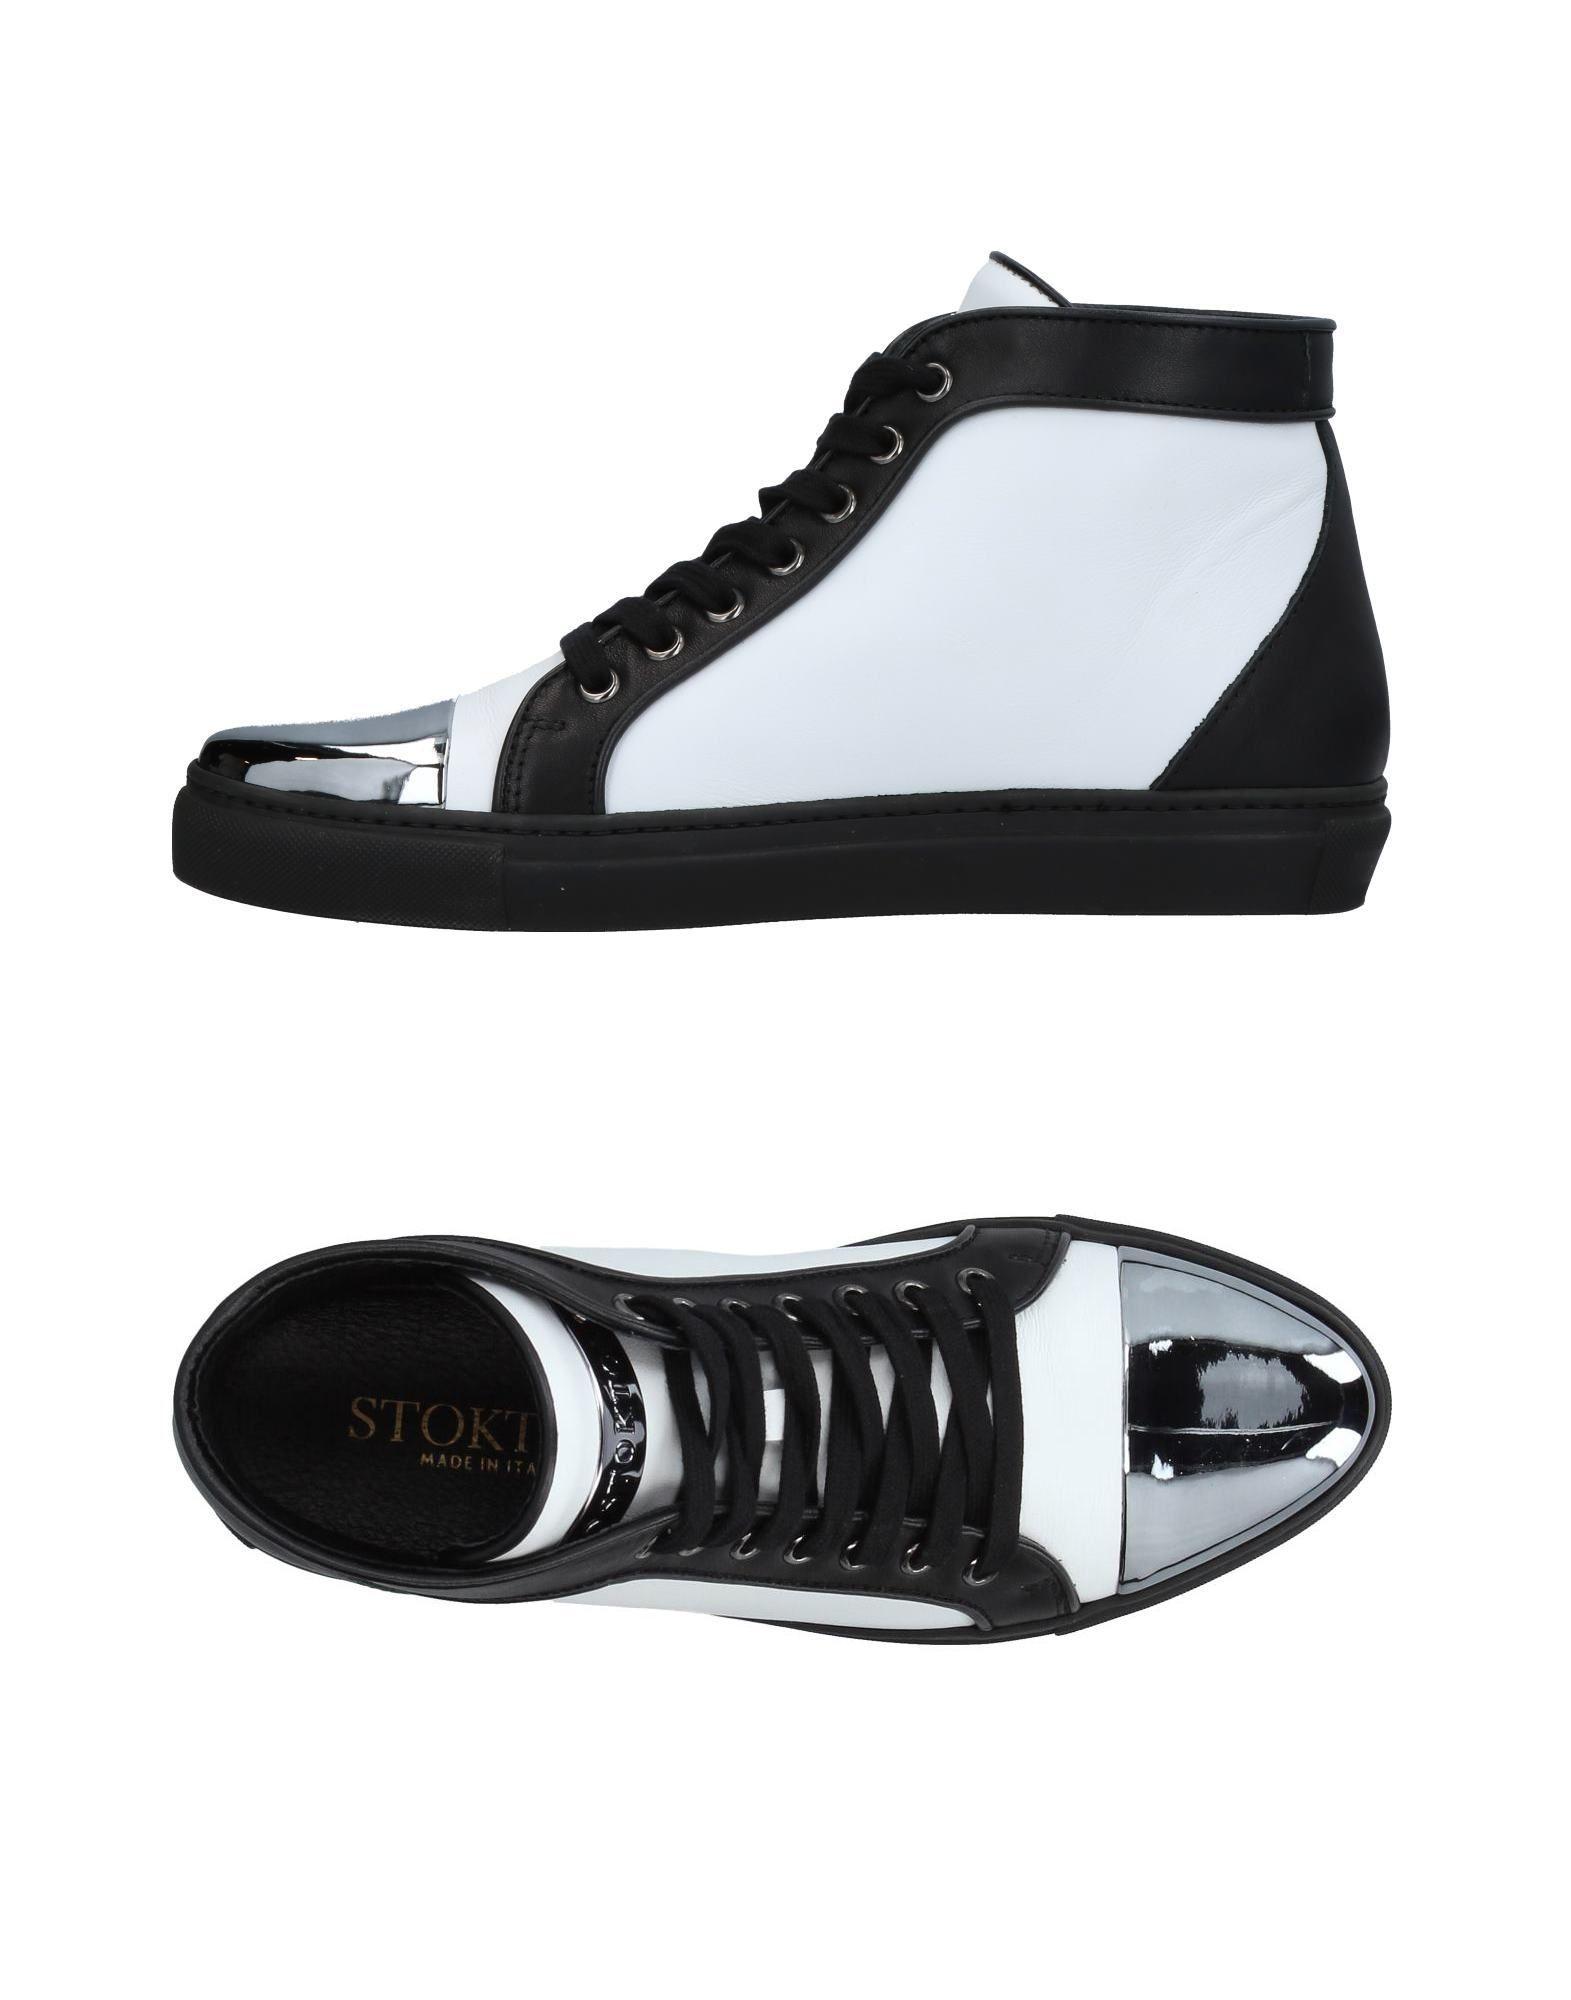 STOKTON Высокие кеды и кроссовки кеды кроссовки высокие dc council mid tx stone camo